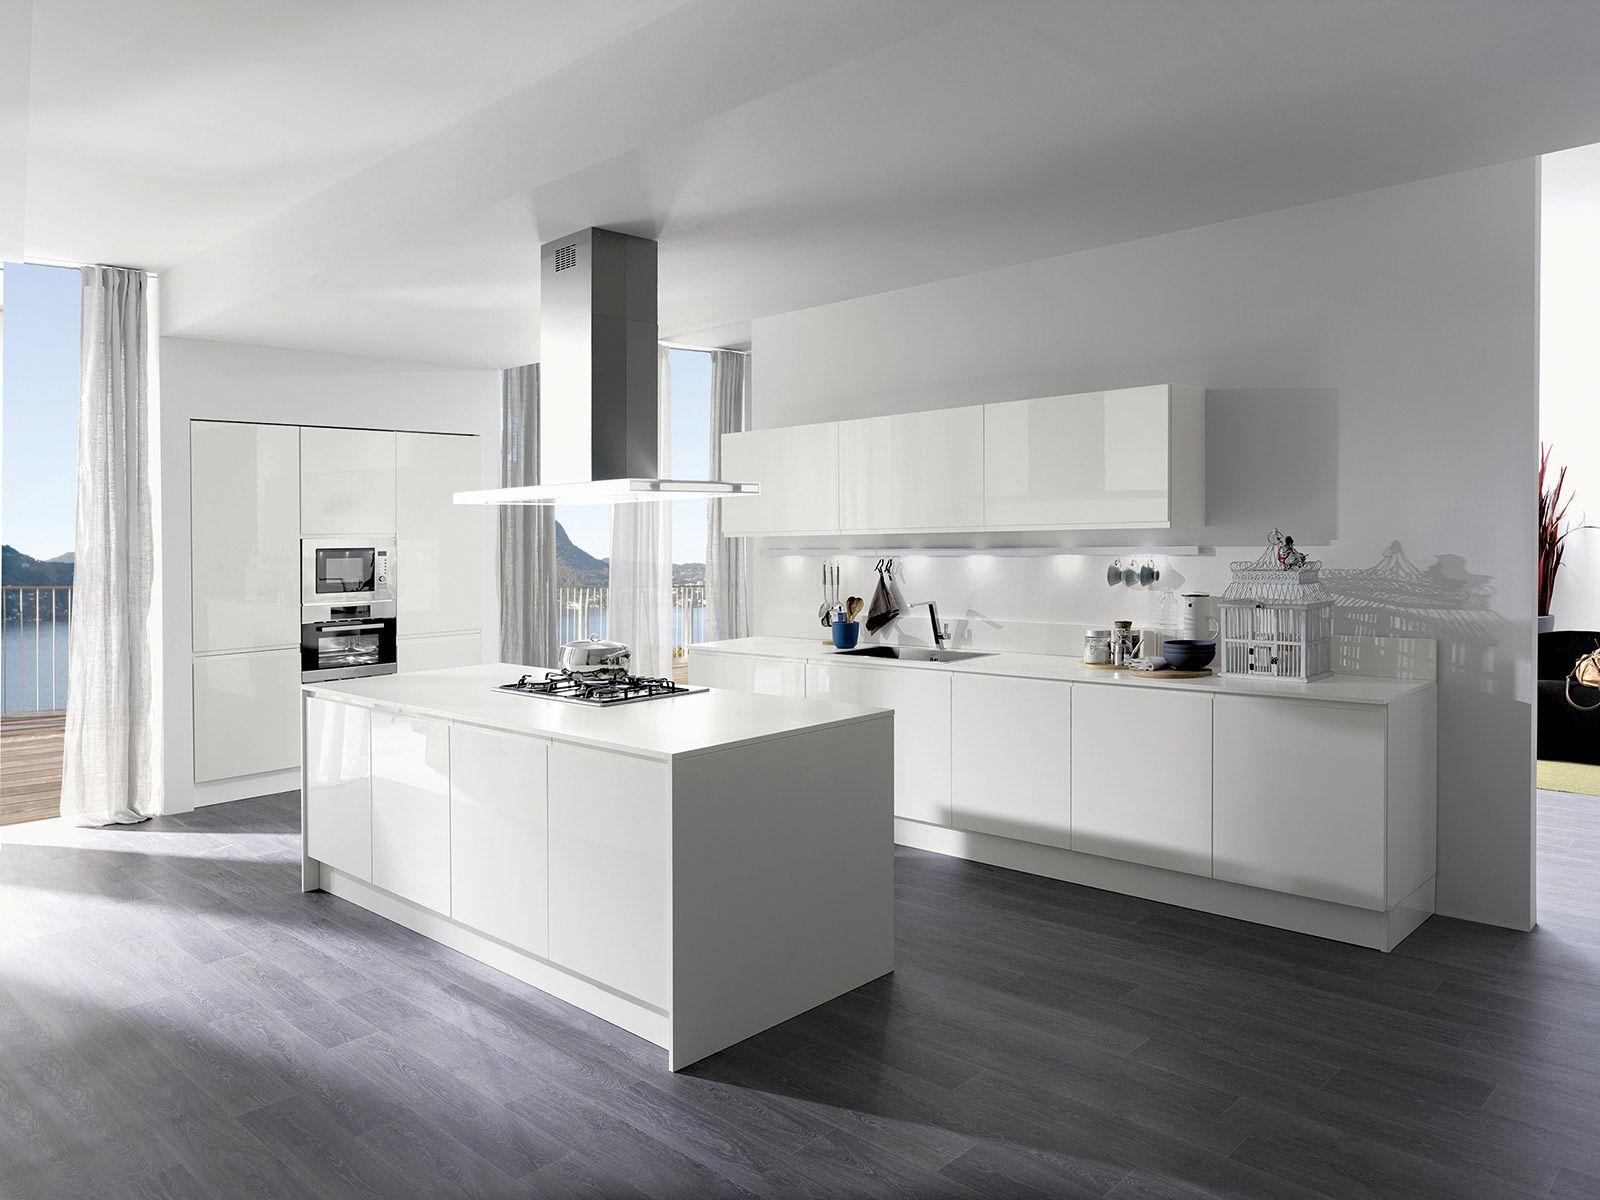 Cucina la voglio tutta bianca home pinterest kitchens and house - Cucina tutta bianca ...